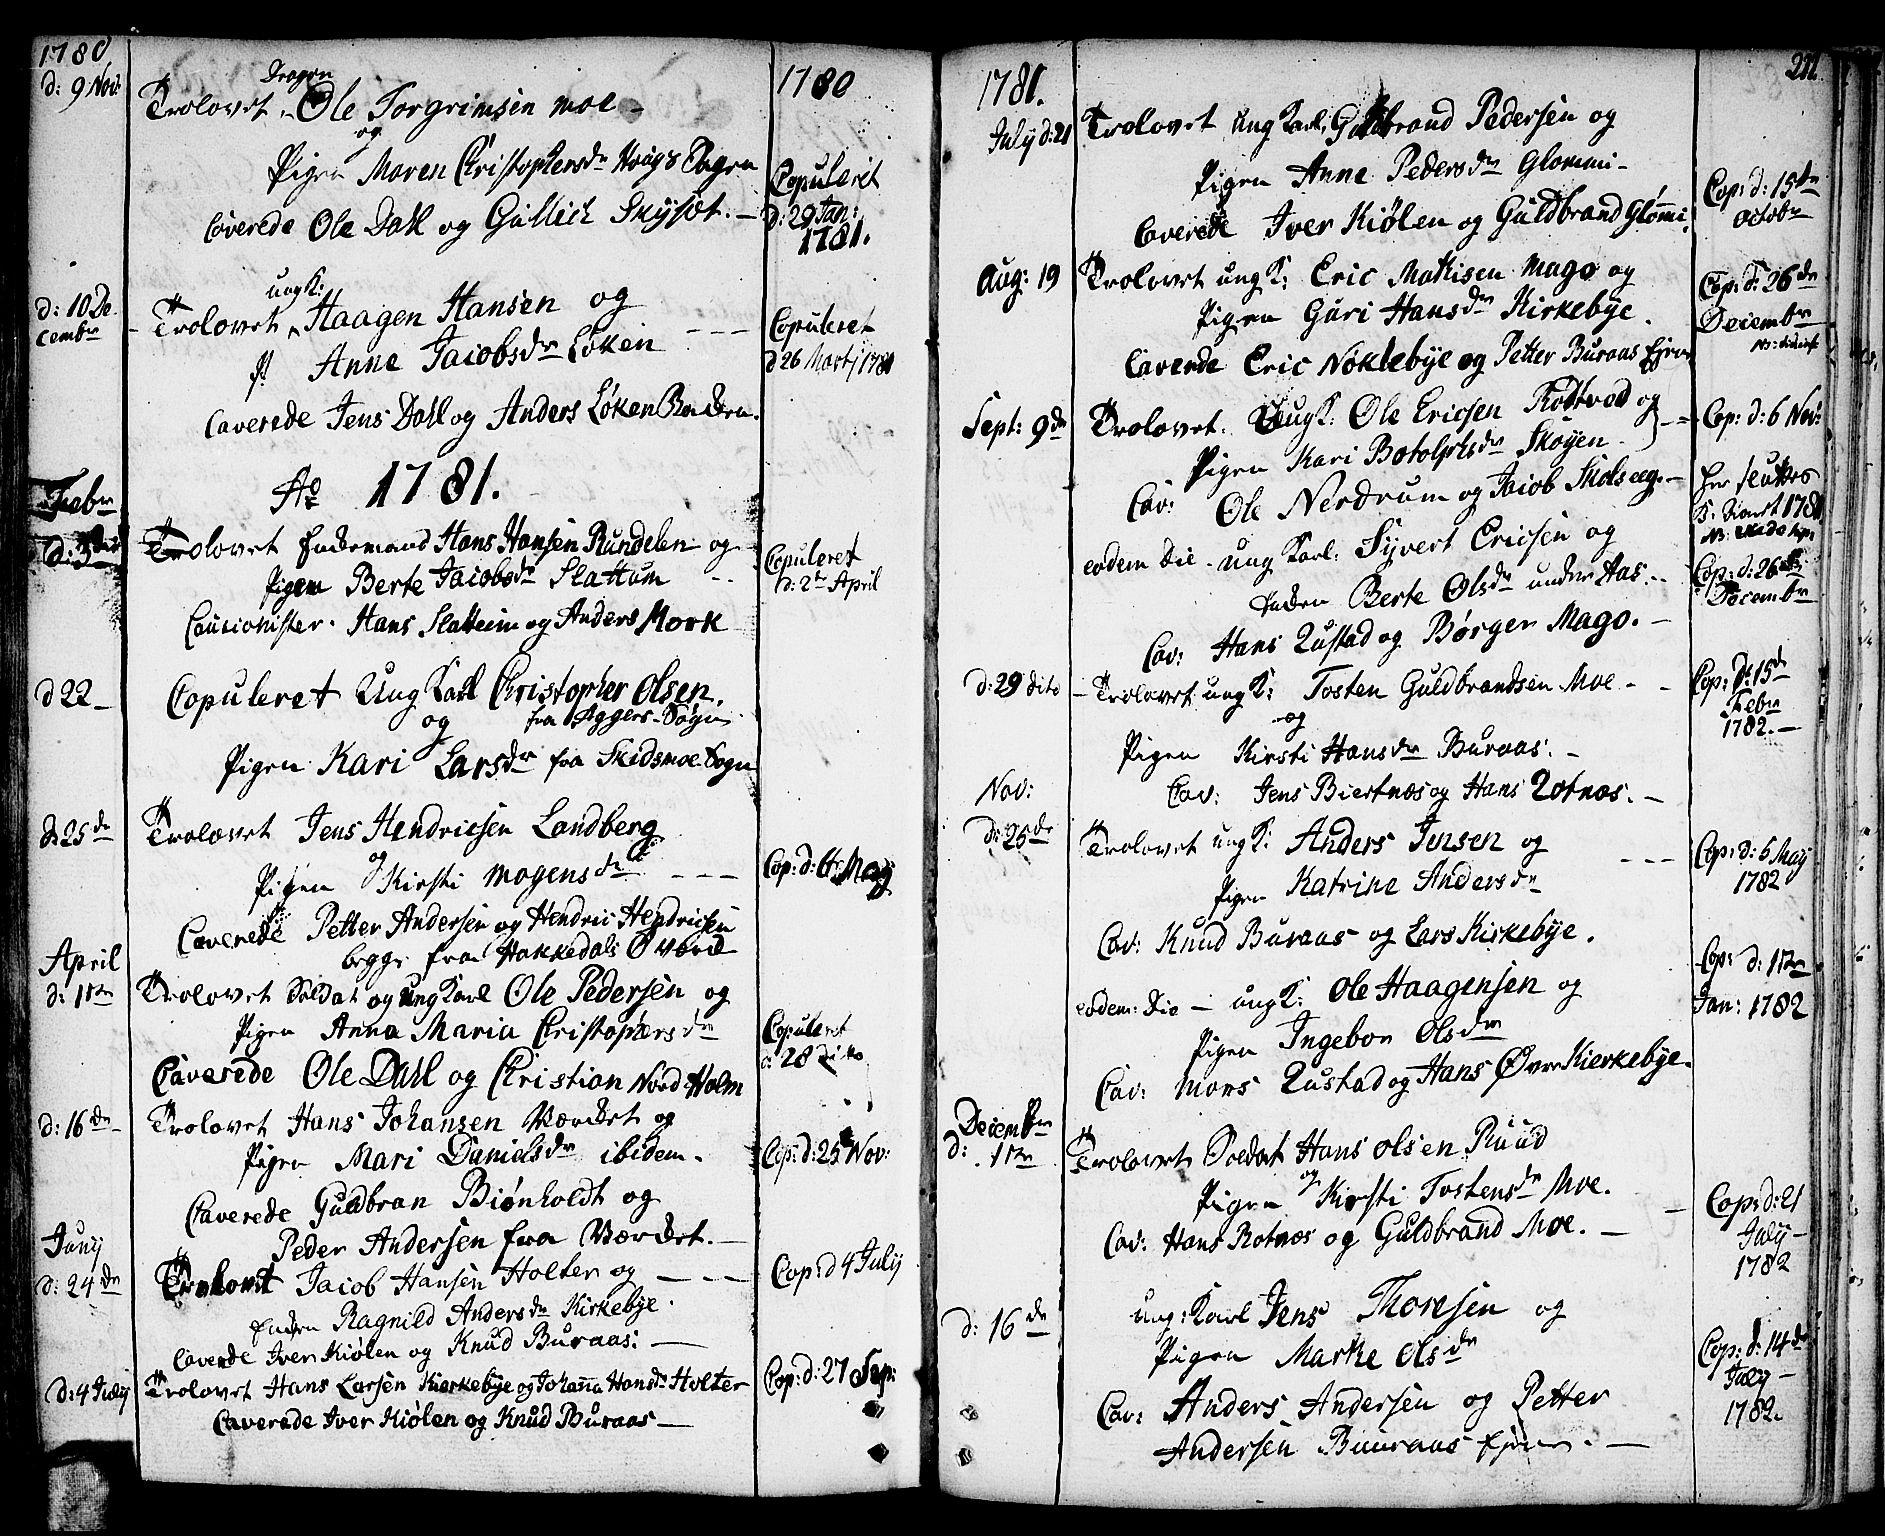 SAO, Nittedal prestekontor Kirkebøker, F/Fa/L0002: Ministerialbok nr. I 2, 1779-1814, s. 211